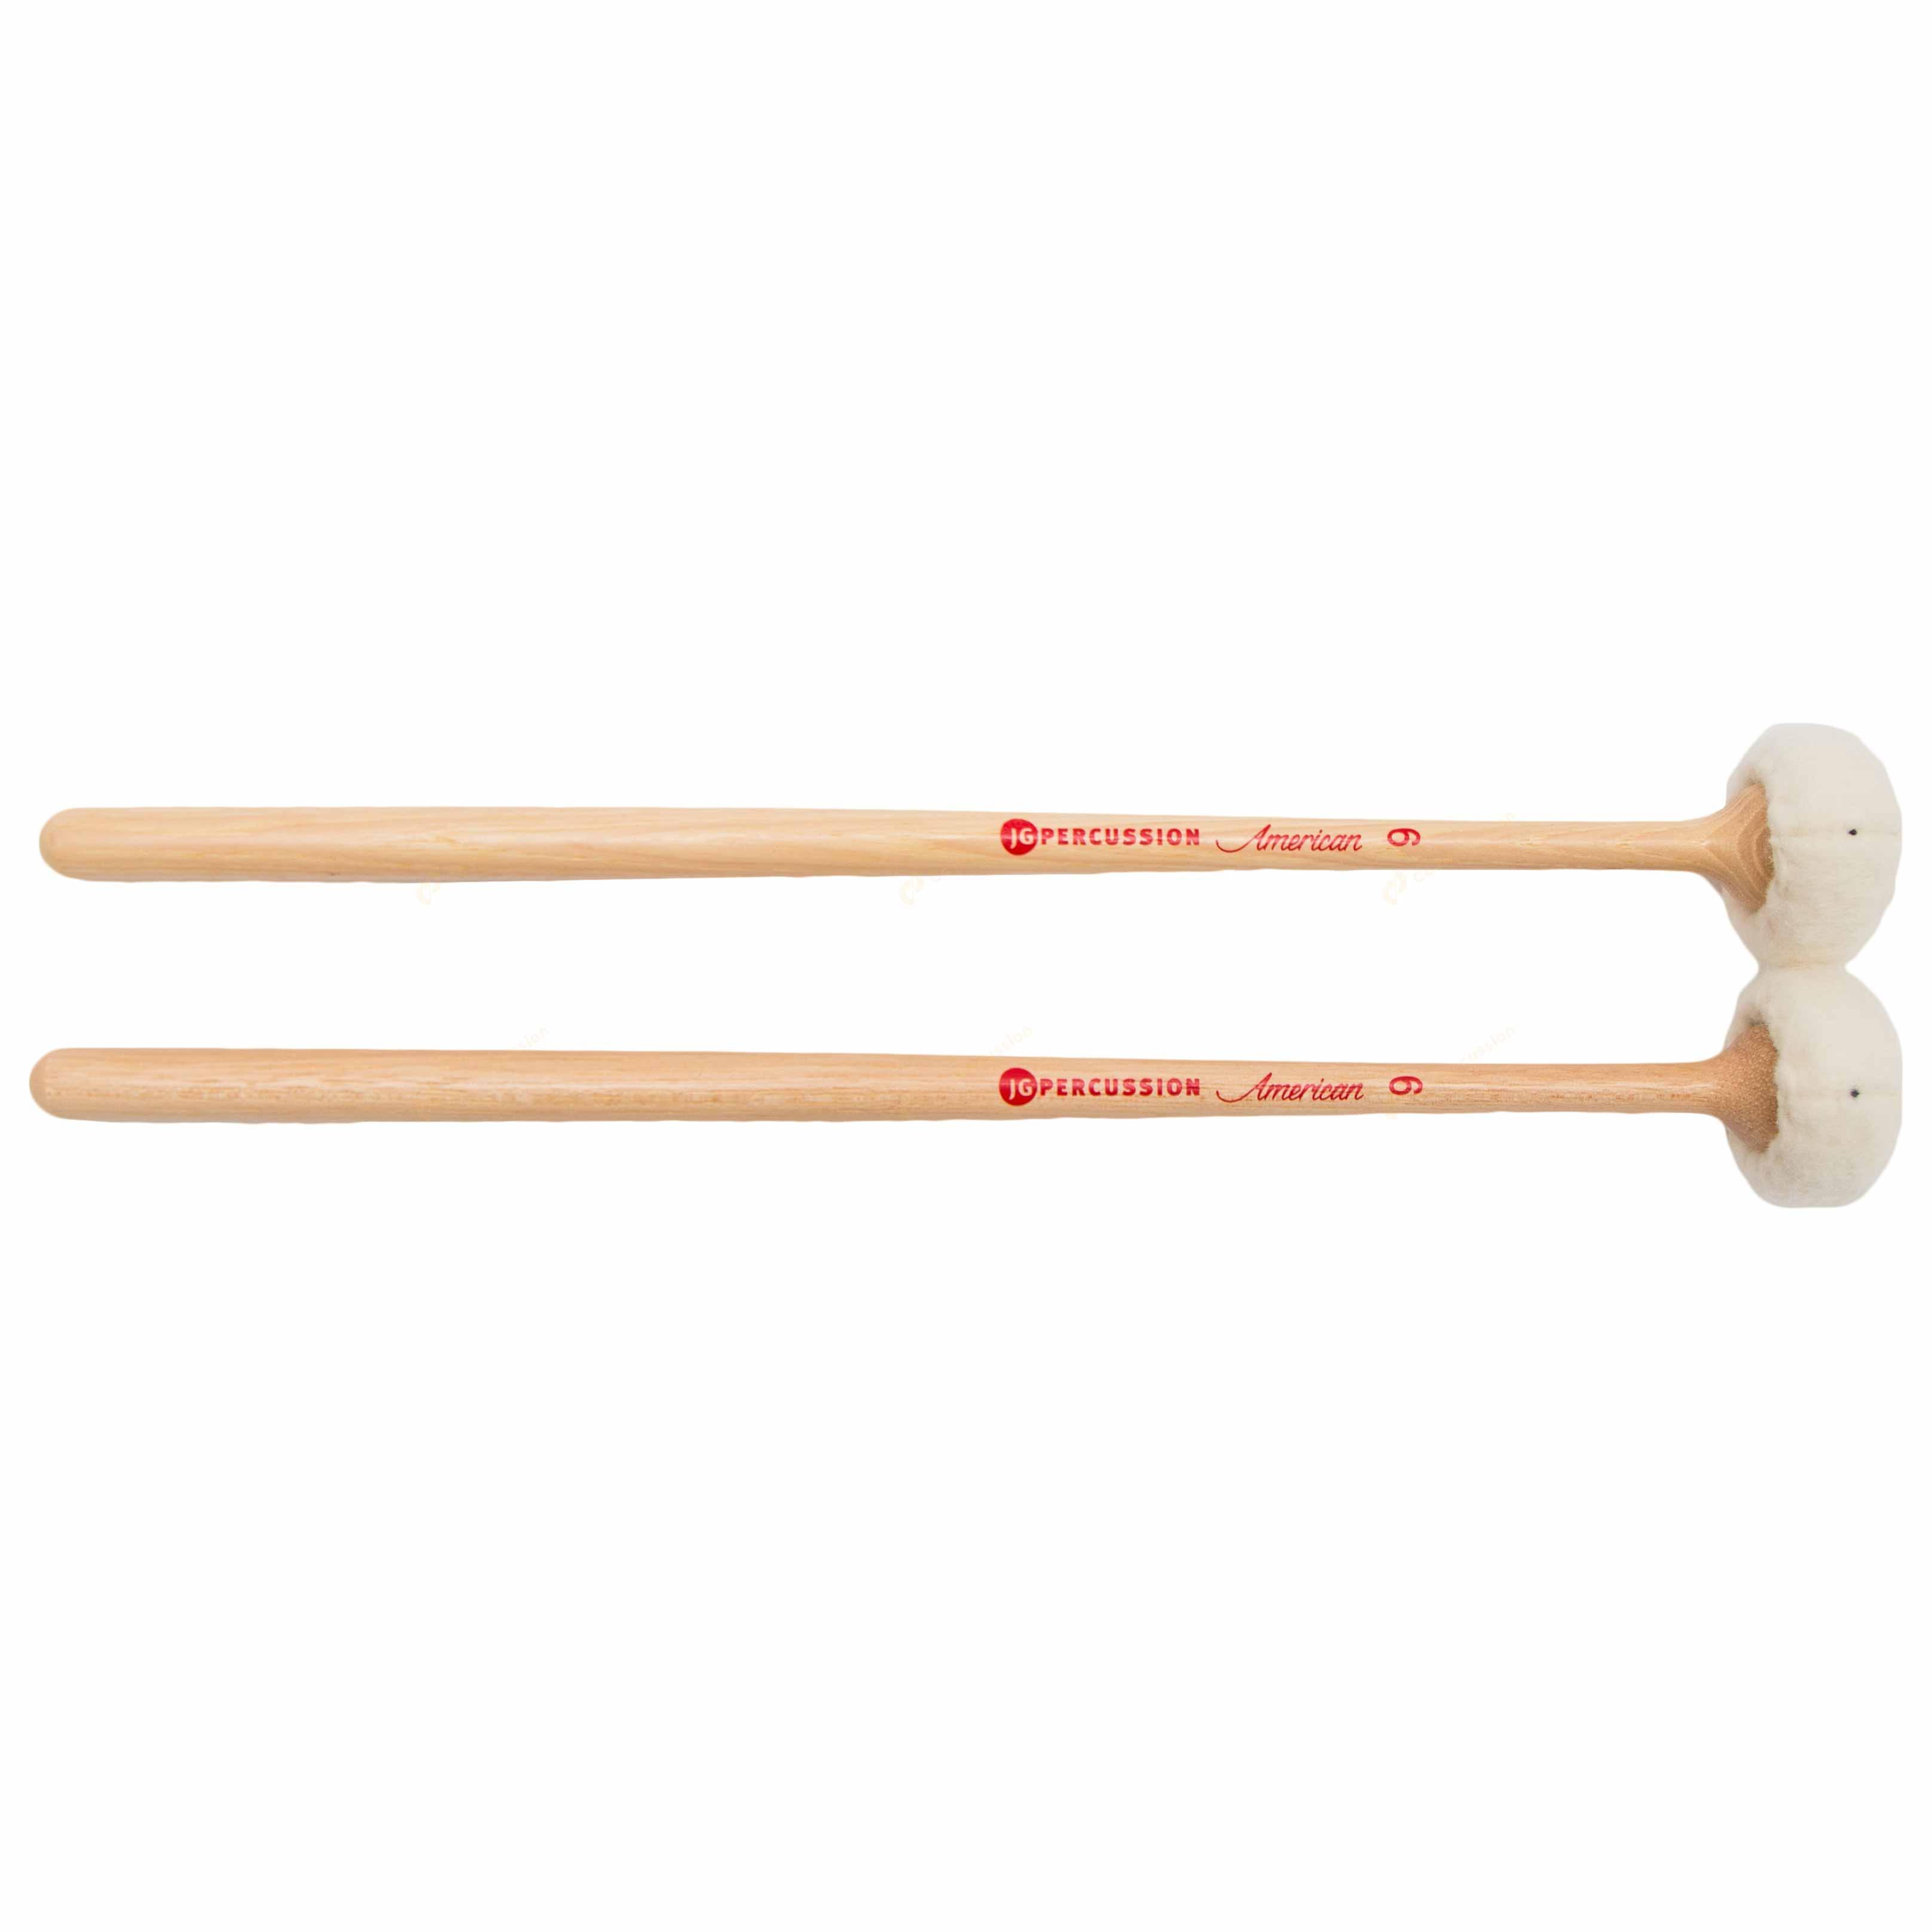 JGpercussion A6 山胡桃木棒身 純手工 美國風格系列定音鼓棒